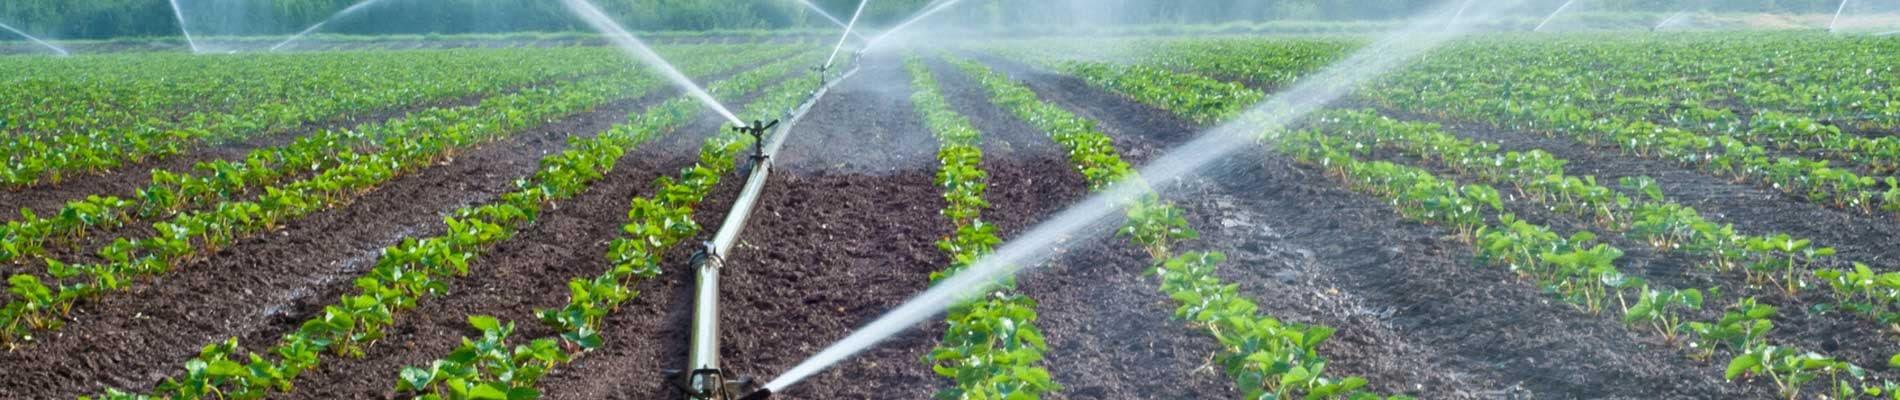 Agricultura, jardineria i mineralogia